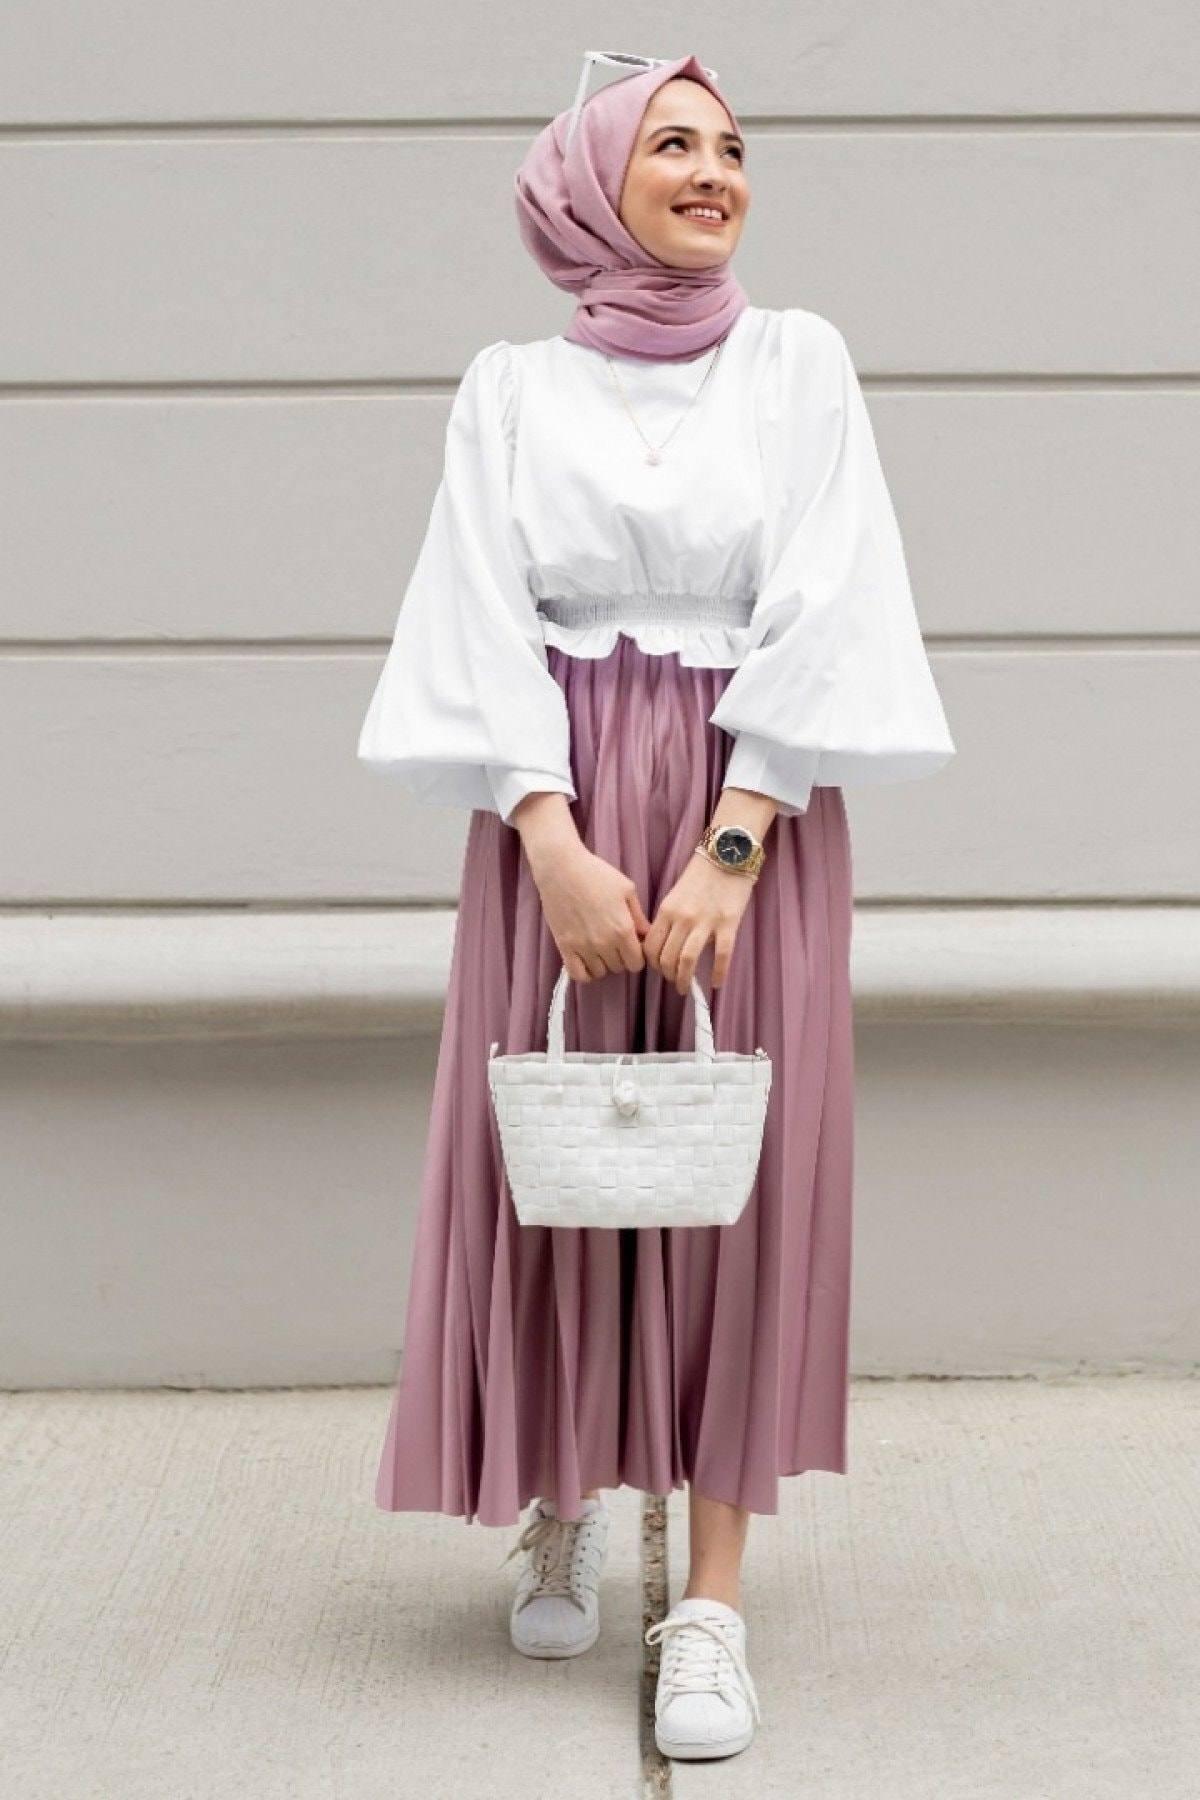 Muslim Abayas Suit Hijab Dress 2 PIECES Bottom and Top Fashion 4 Season Islamic Clothing Caftan Ramadan Dubai Made in Turkey